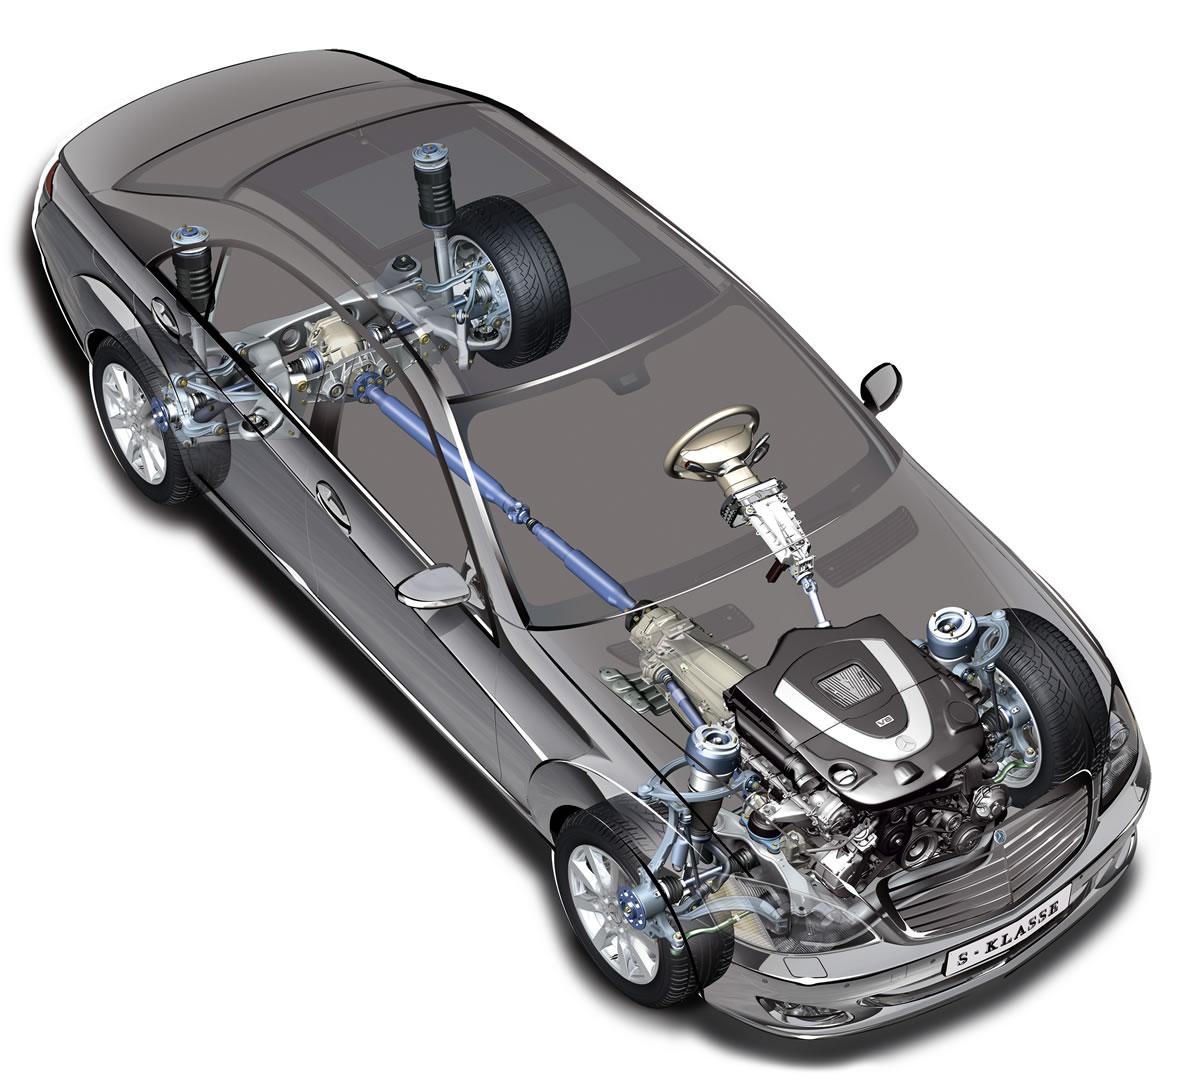 89059519 - GM Bearing. Transfer case. Bearing, trfer case ...  |All Wheel Drive Transfer Case Diagram